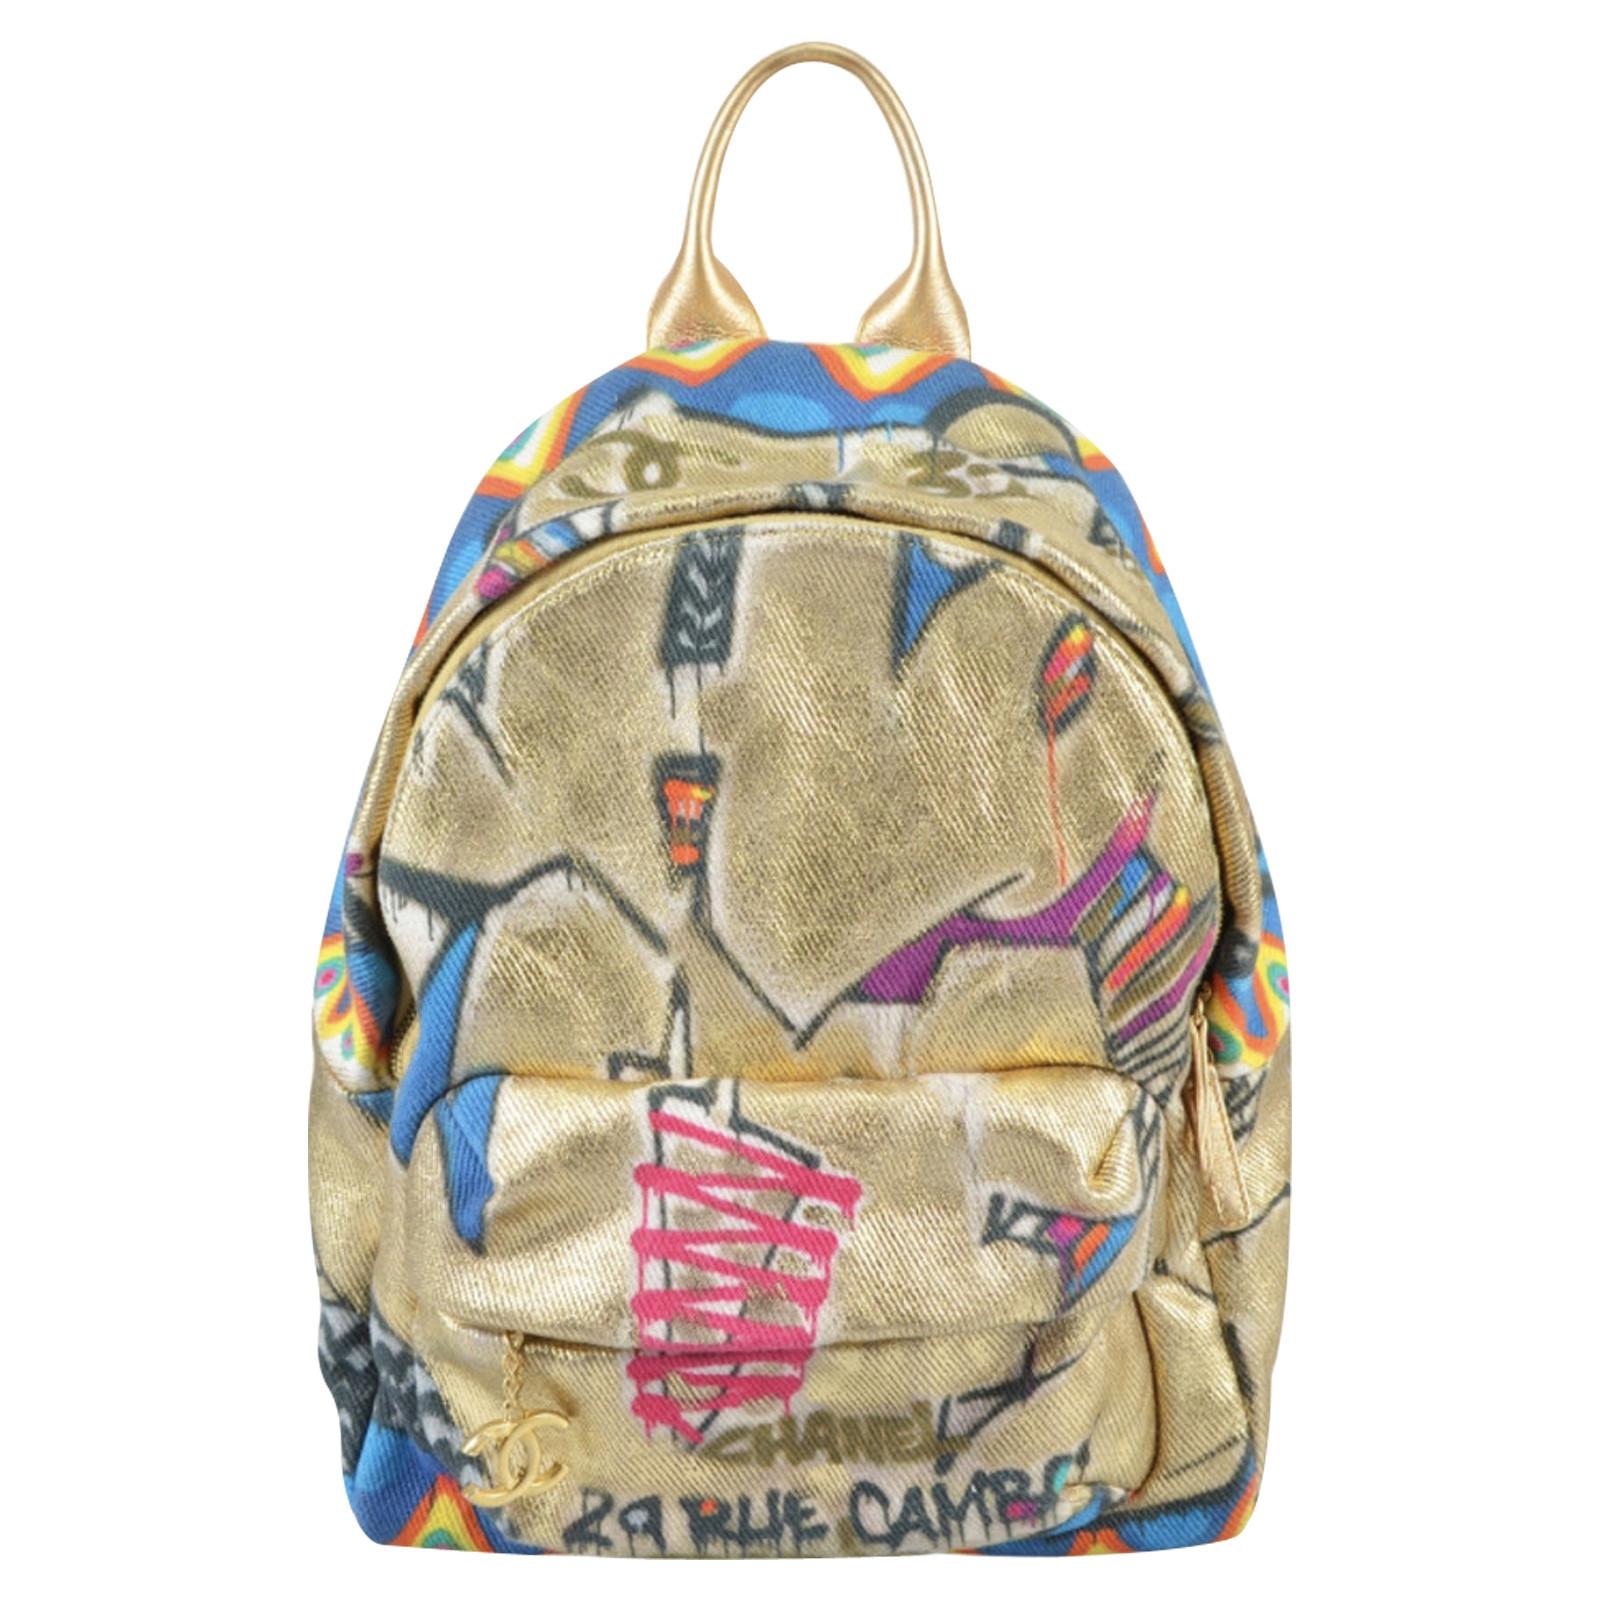 Chanel Graffiti Backpack Linen Second Hand Chanel Graffiti Backpack Linen Buy Used For 3400 4474396